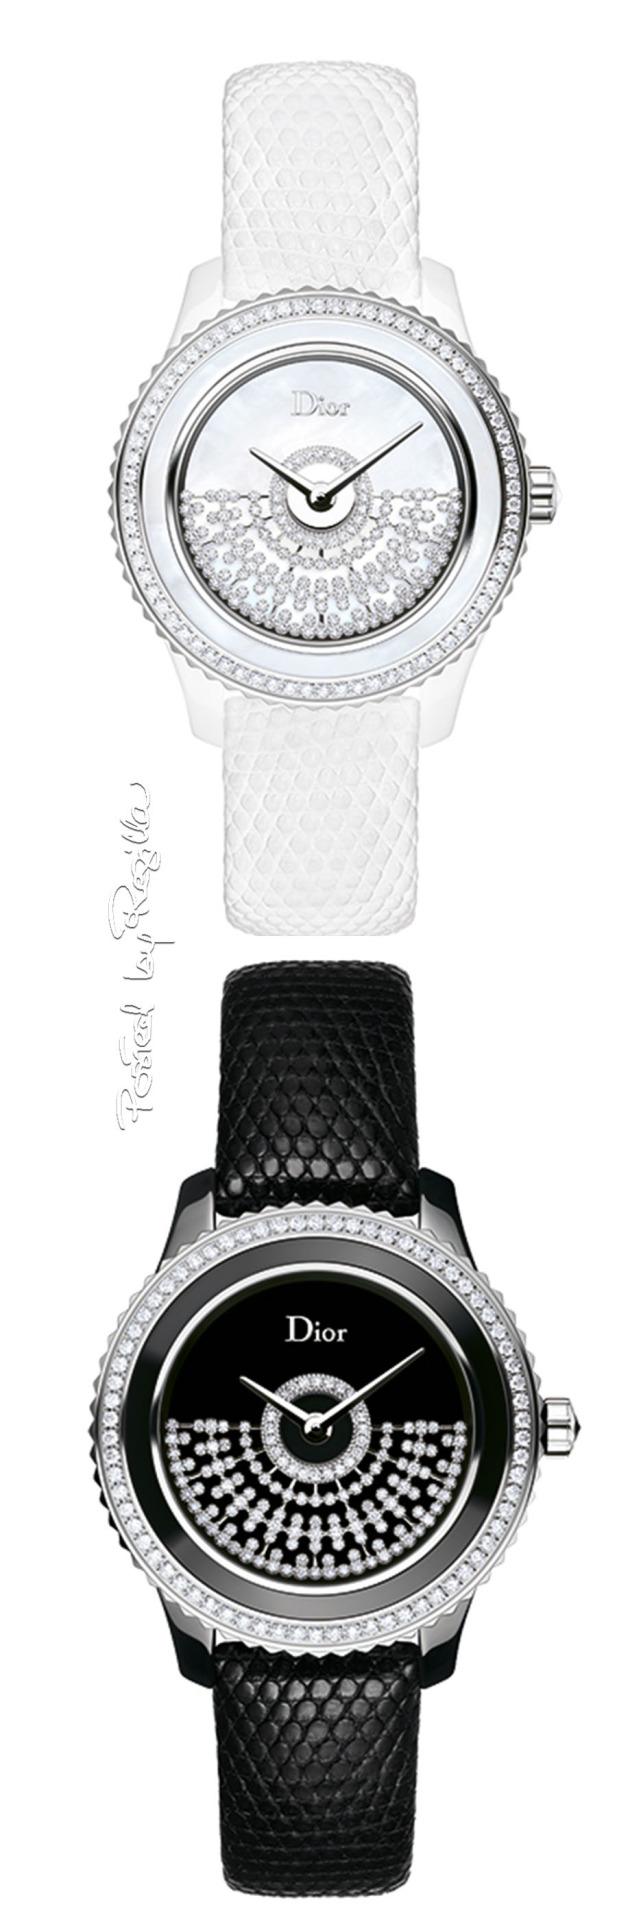 Dior Black and White diamond watches